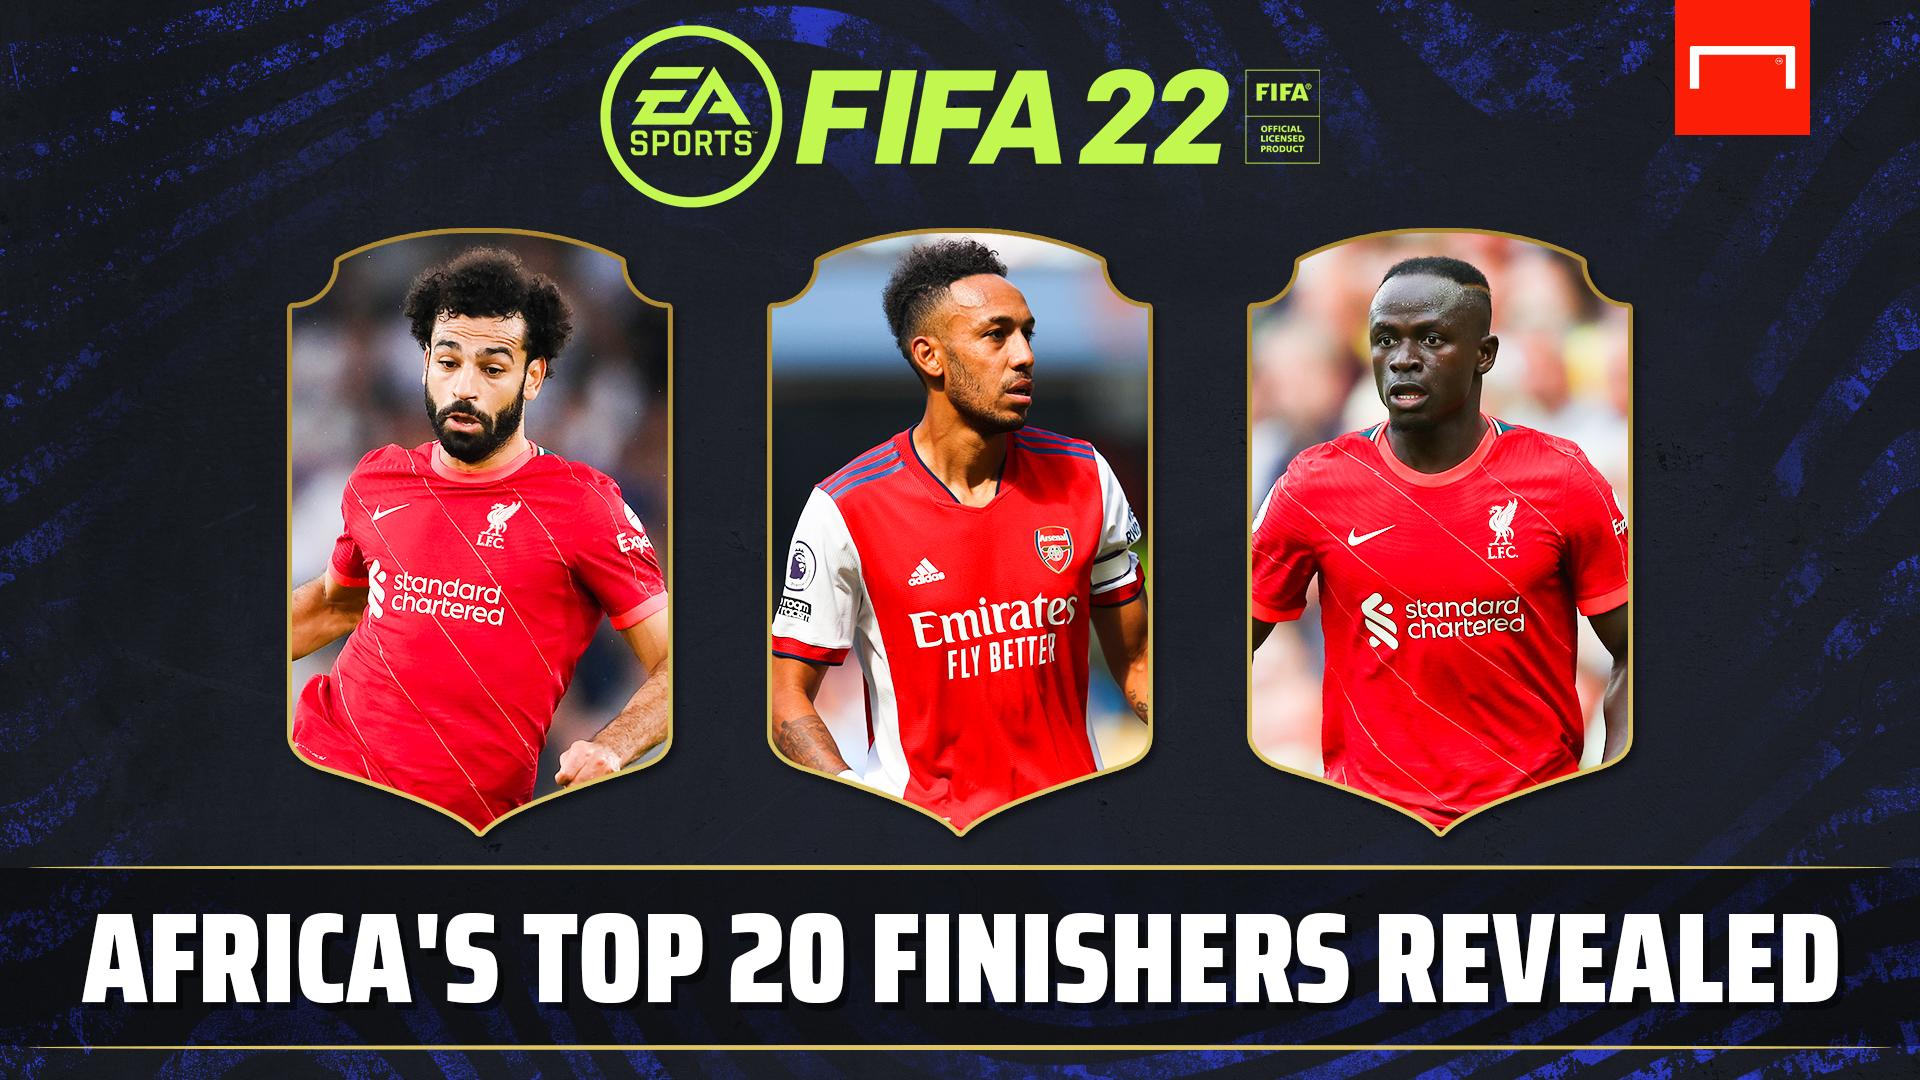 FIFA22: Africa's 20 best finishers revealed